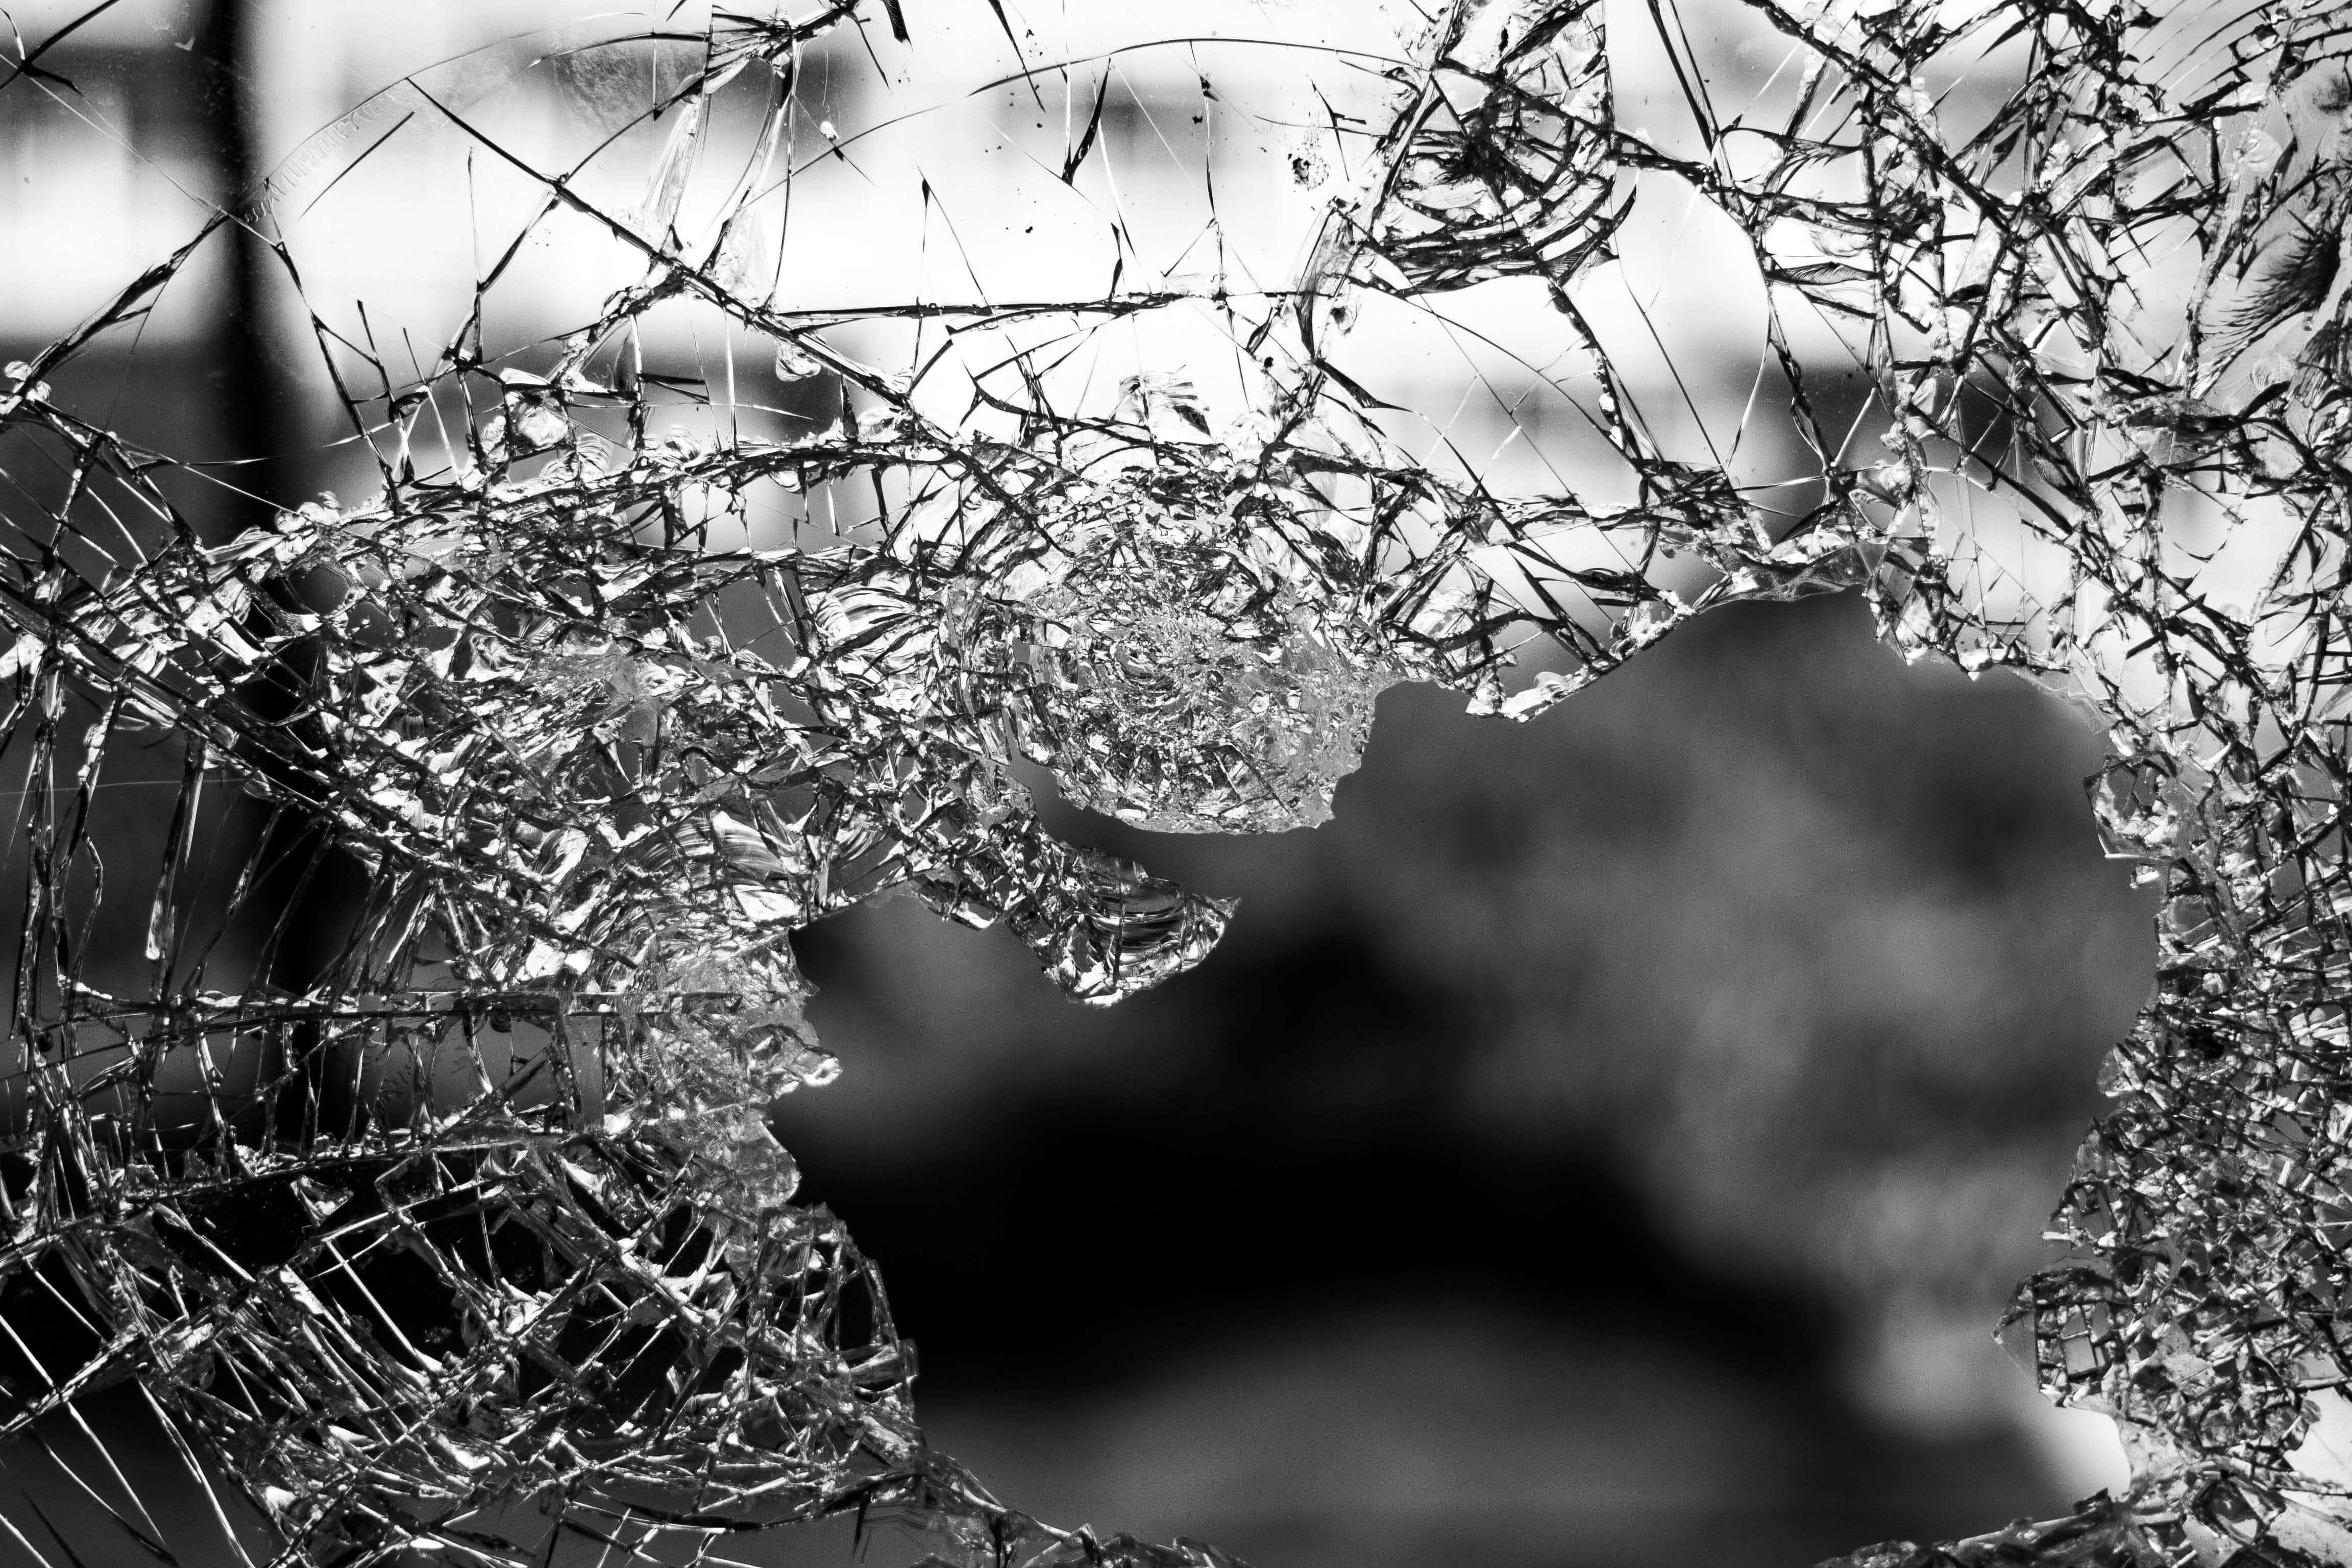 Brokenglass 1.optimized